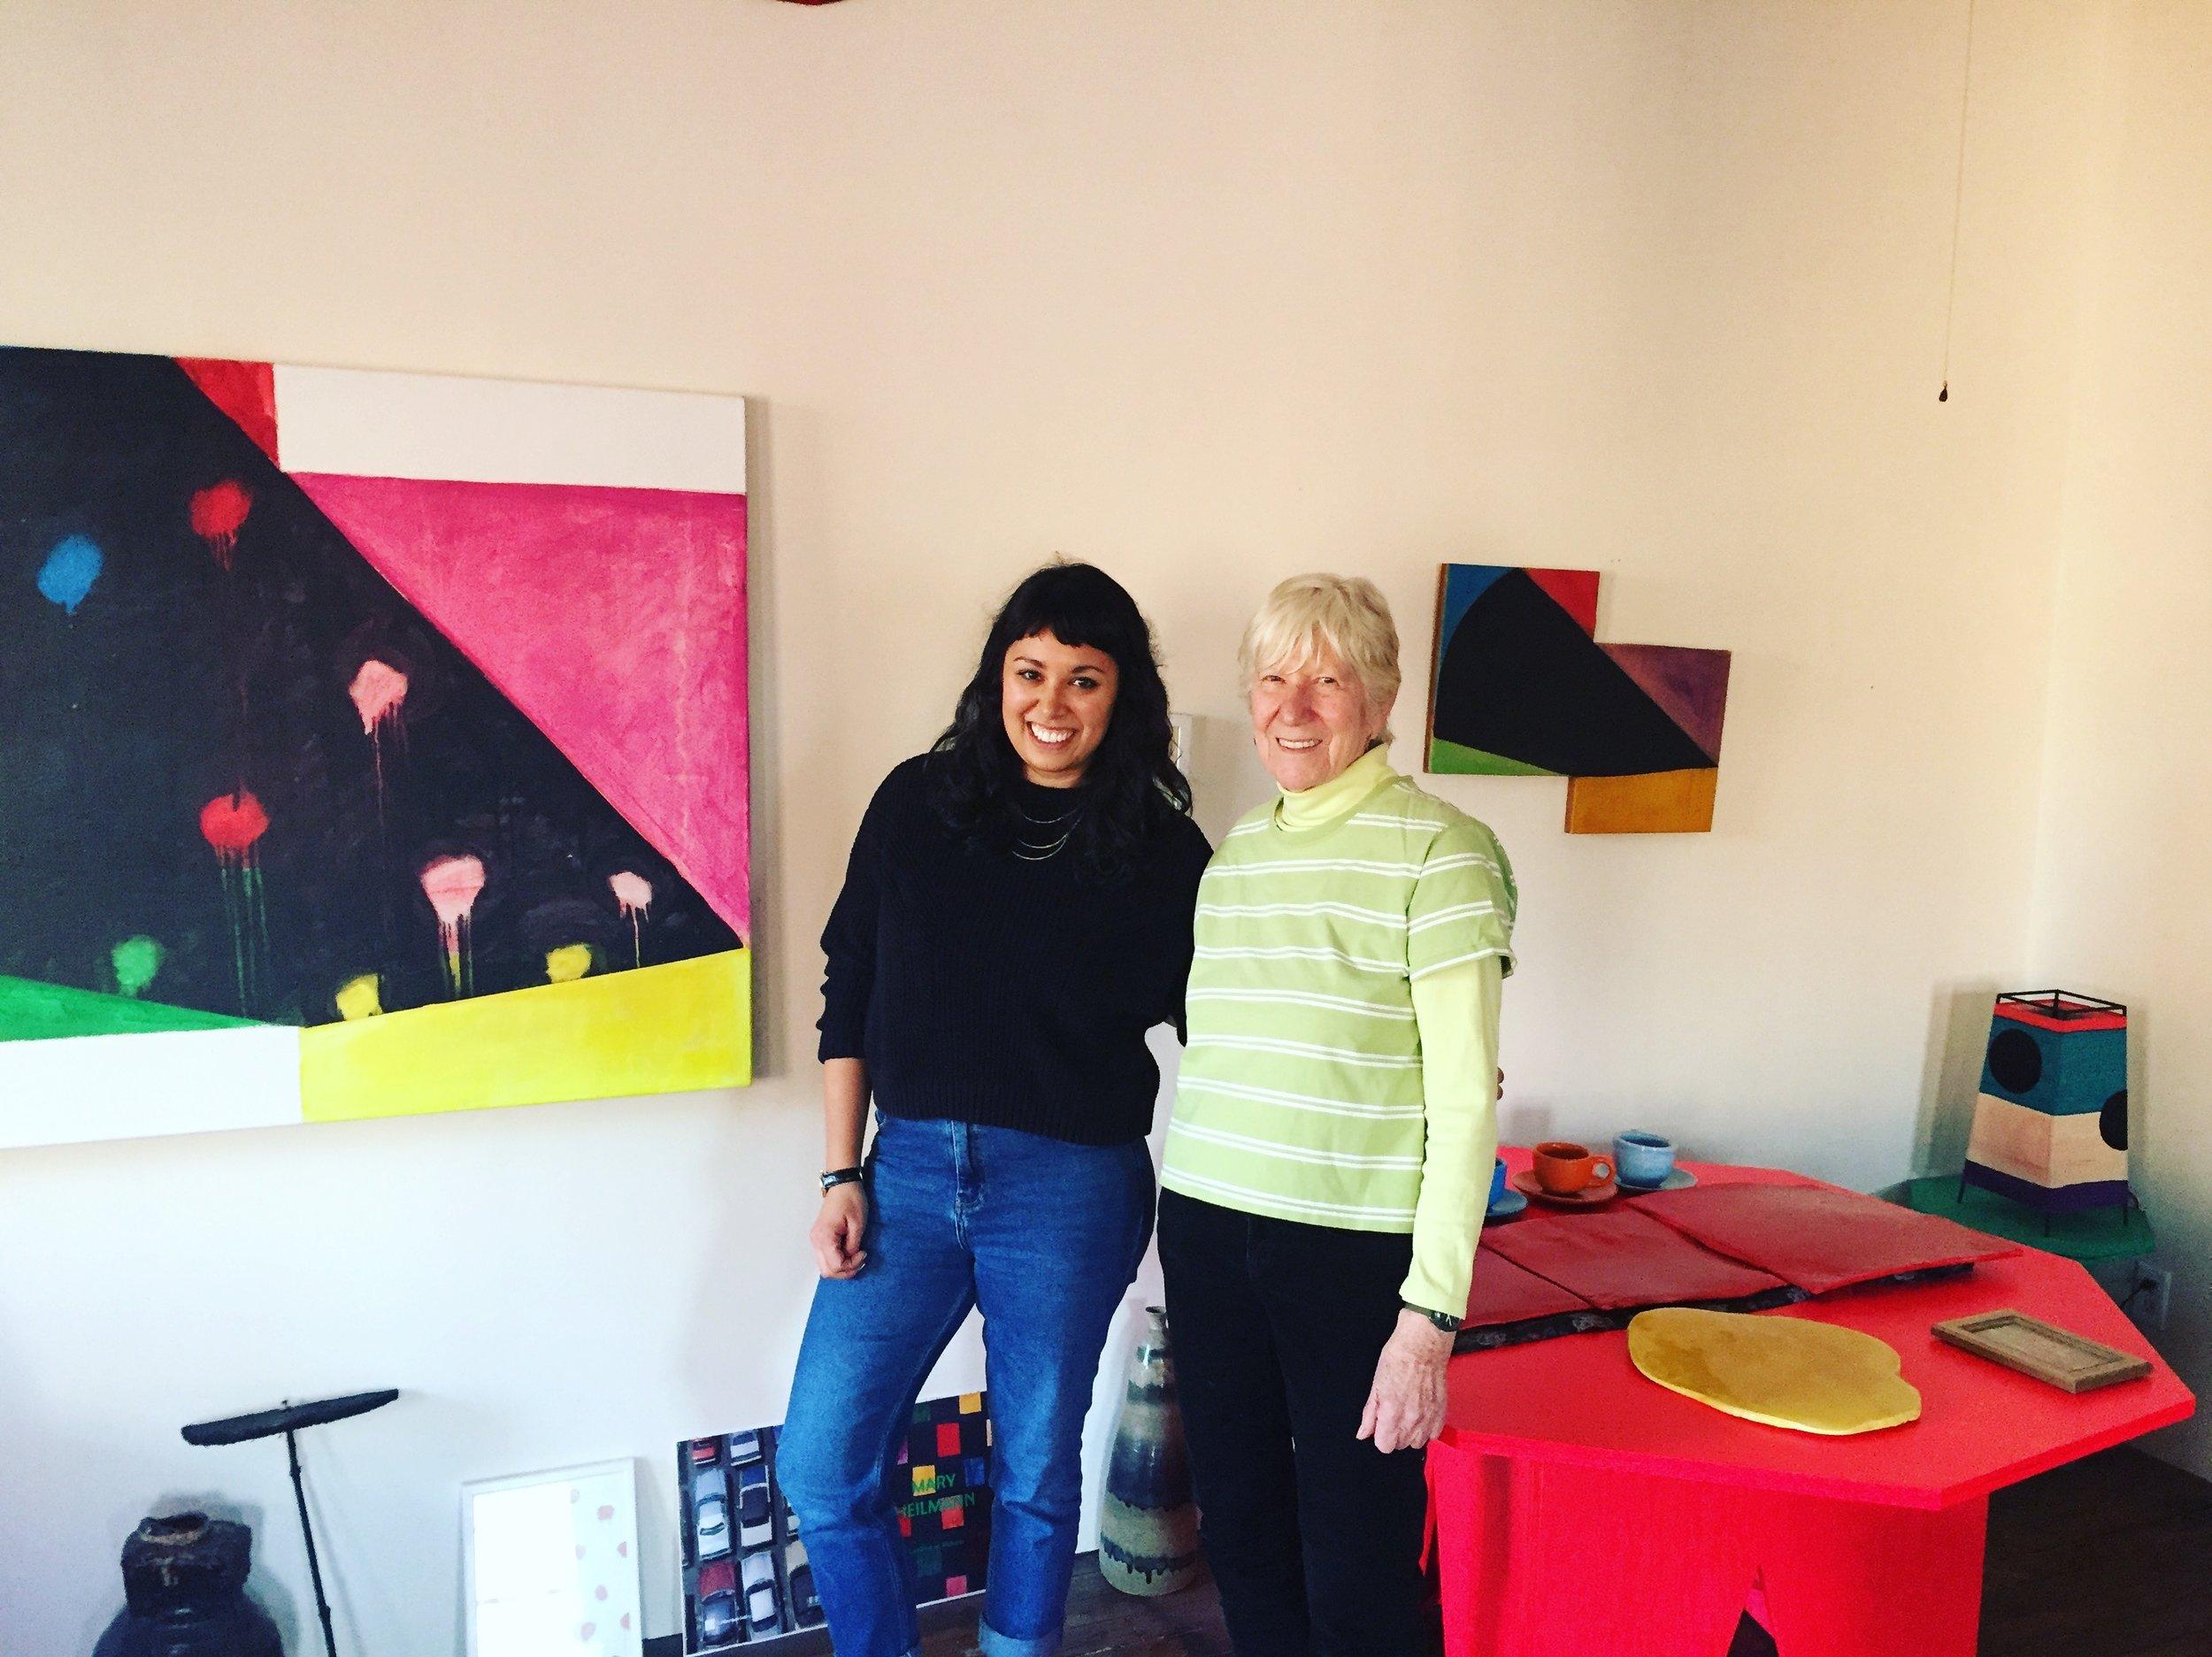 - Mary Heilmann, Jessica Wilson New York, February 2017